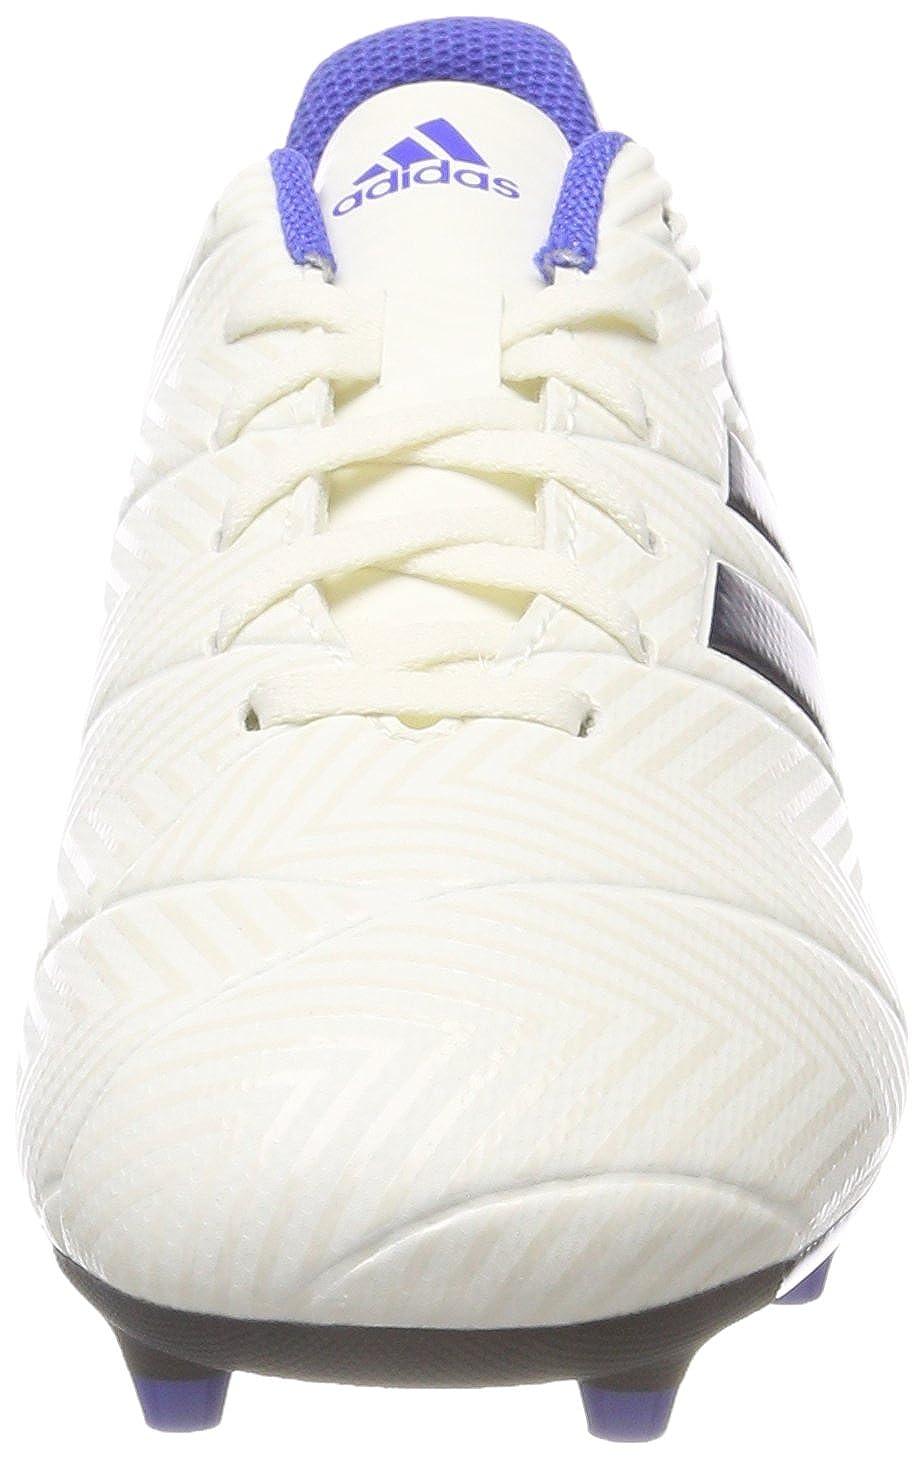 Adidas Damen Nemeziz W 18.4 Fg W Nemeziz Fußballschuhe c3ff9b